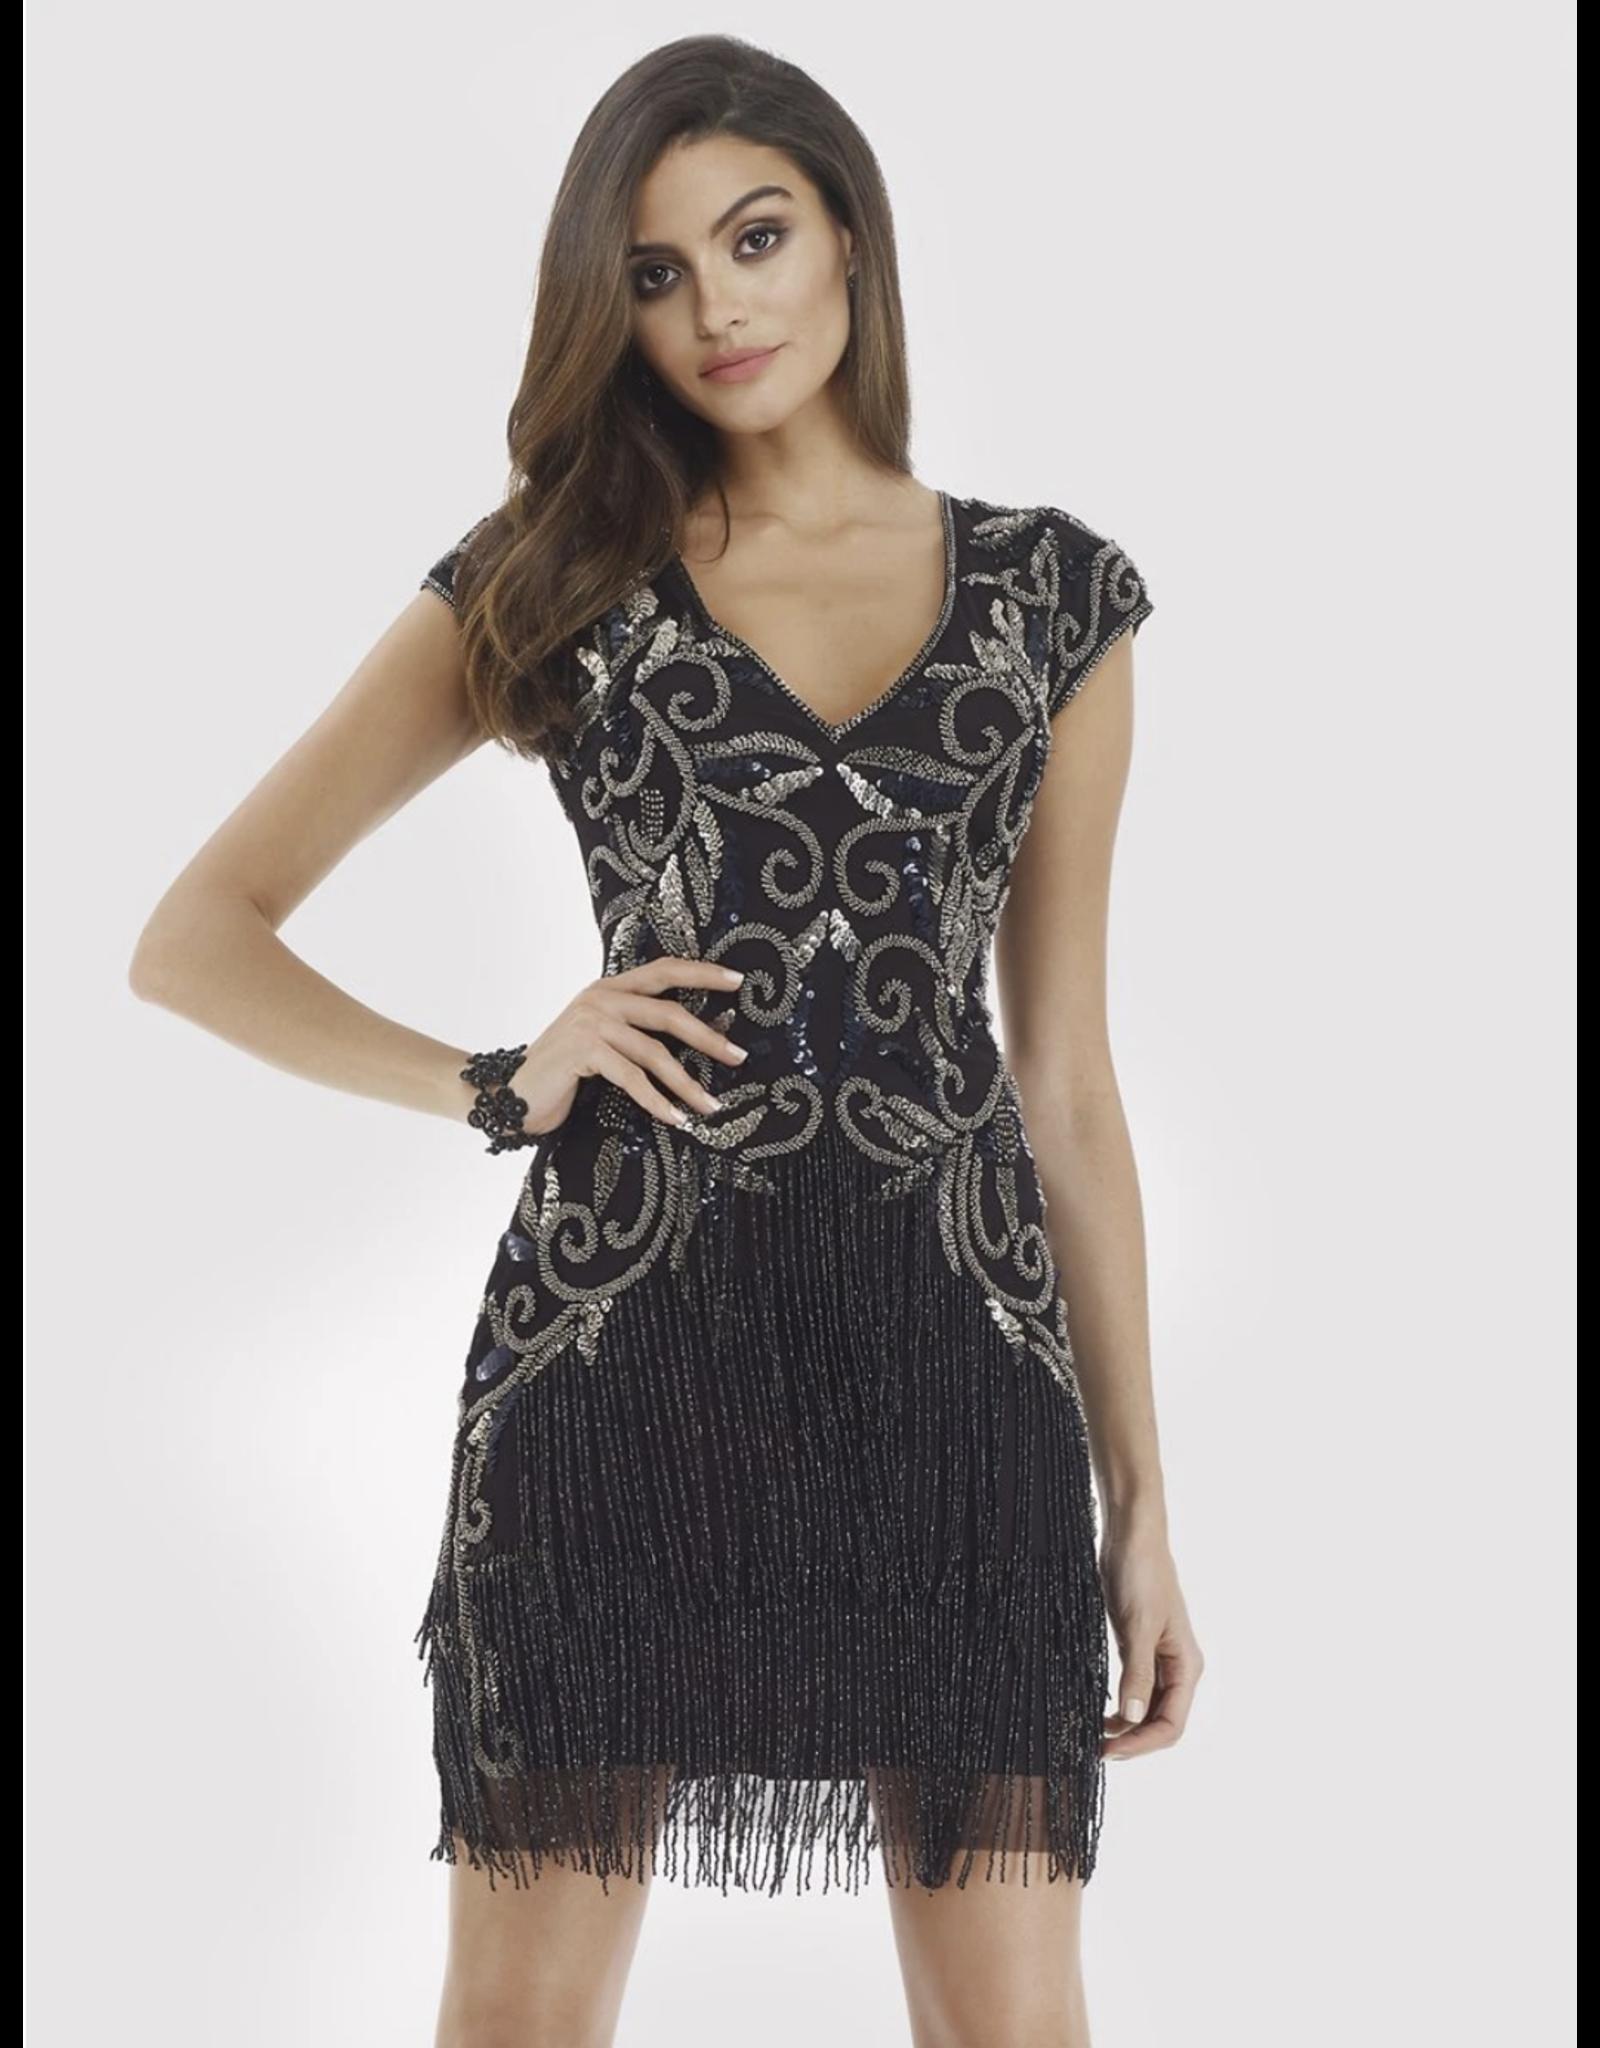 Lara 29579 Lara Dresses